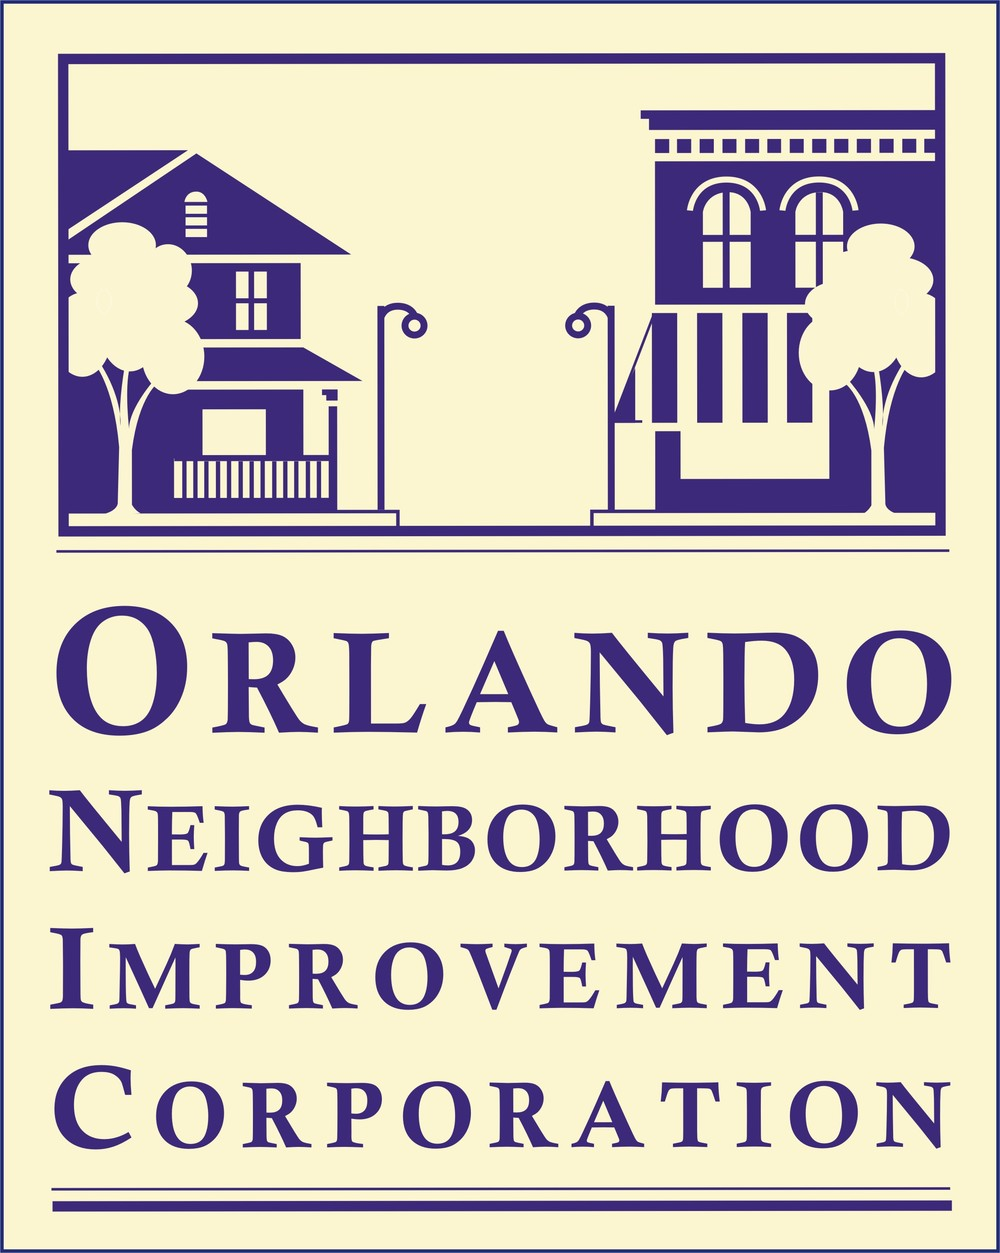 ONIC 8x10 color logo 6-09.jpg